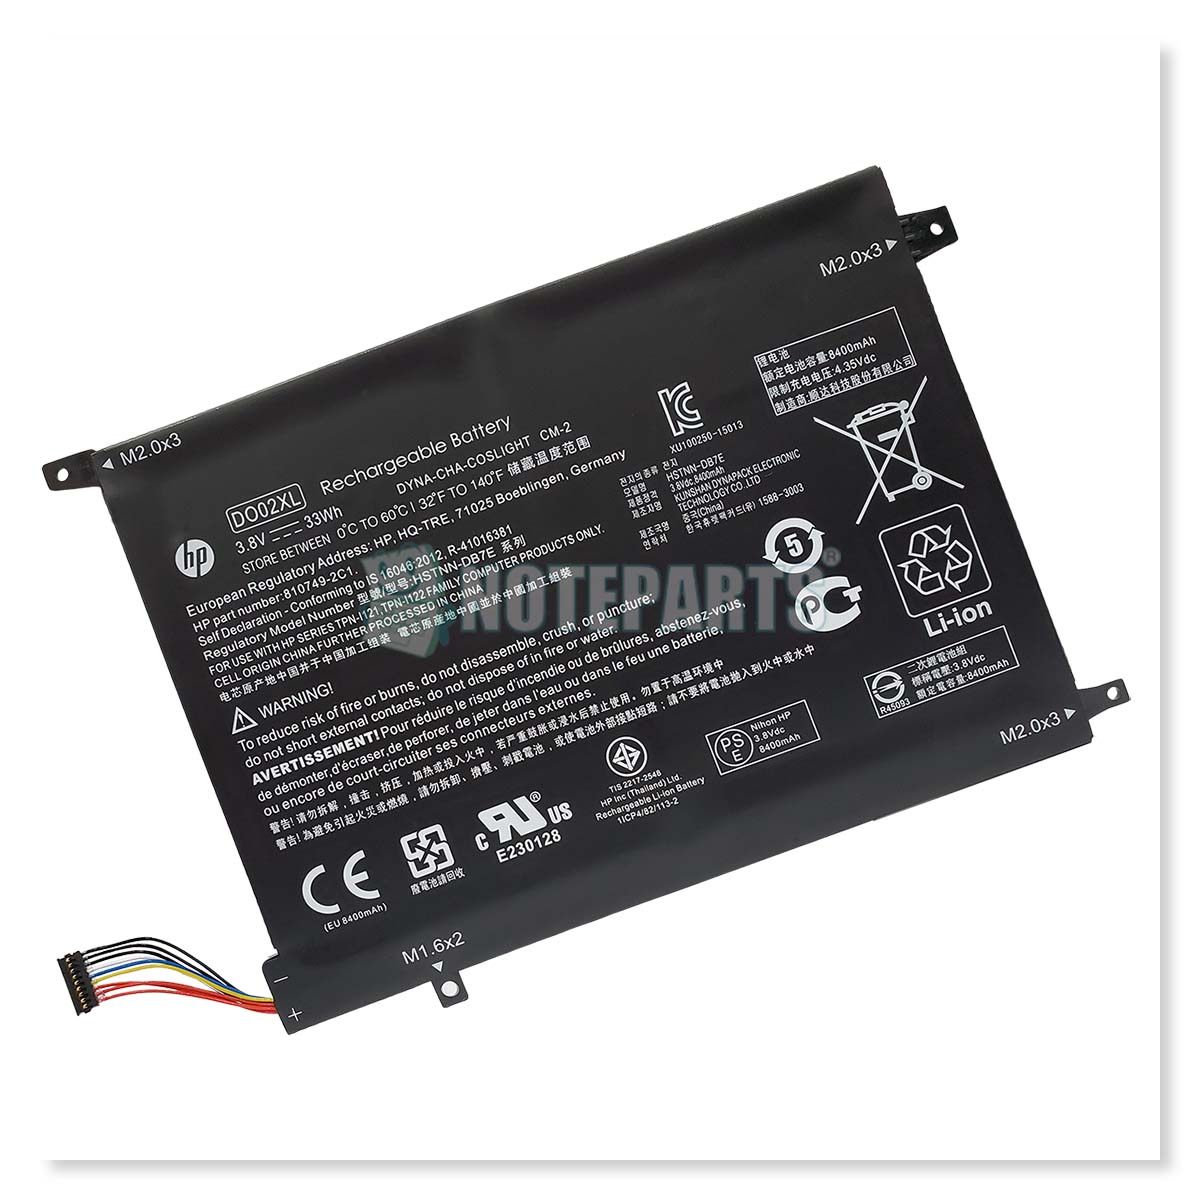 HP純正 x2 210 G1 バッテリー 810749-2C1 810749-421 DO02XL